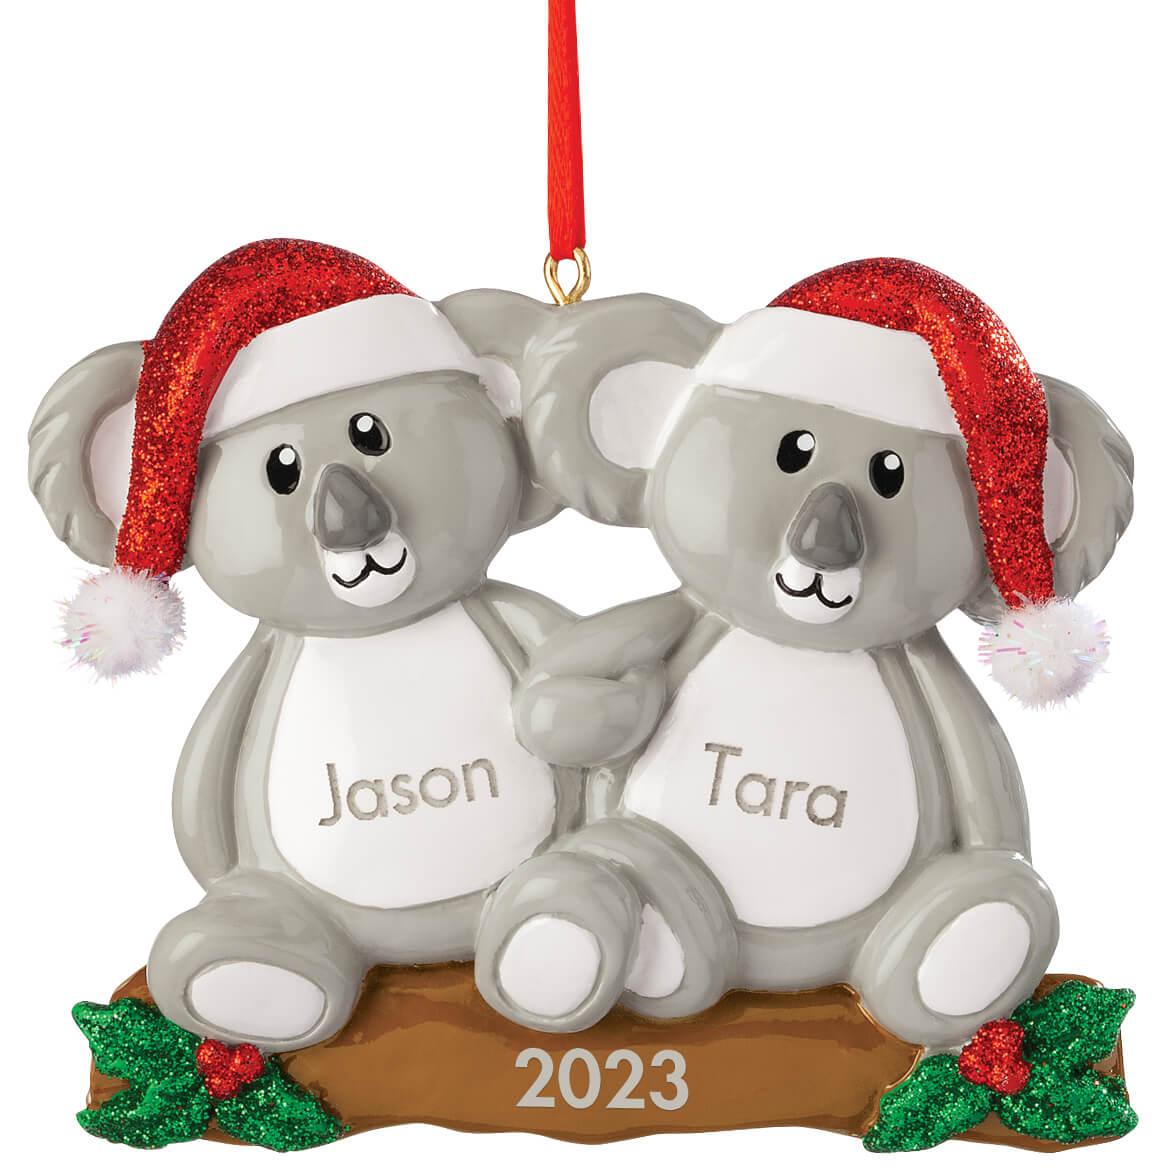 Personalized Koala Couple Ornament-370465